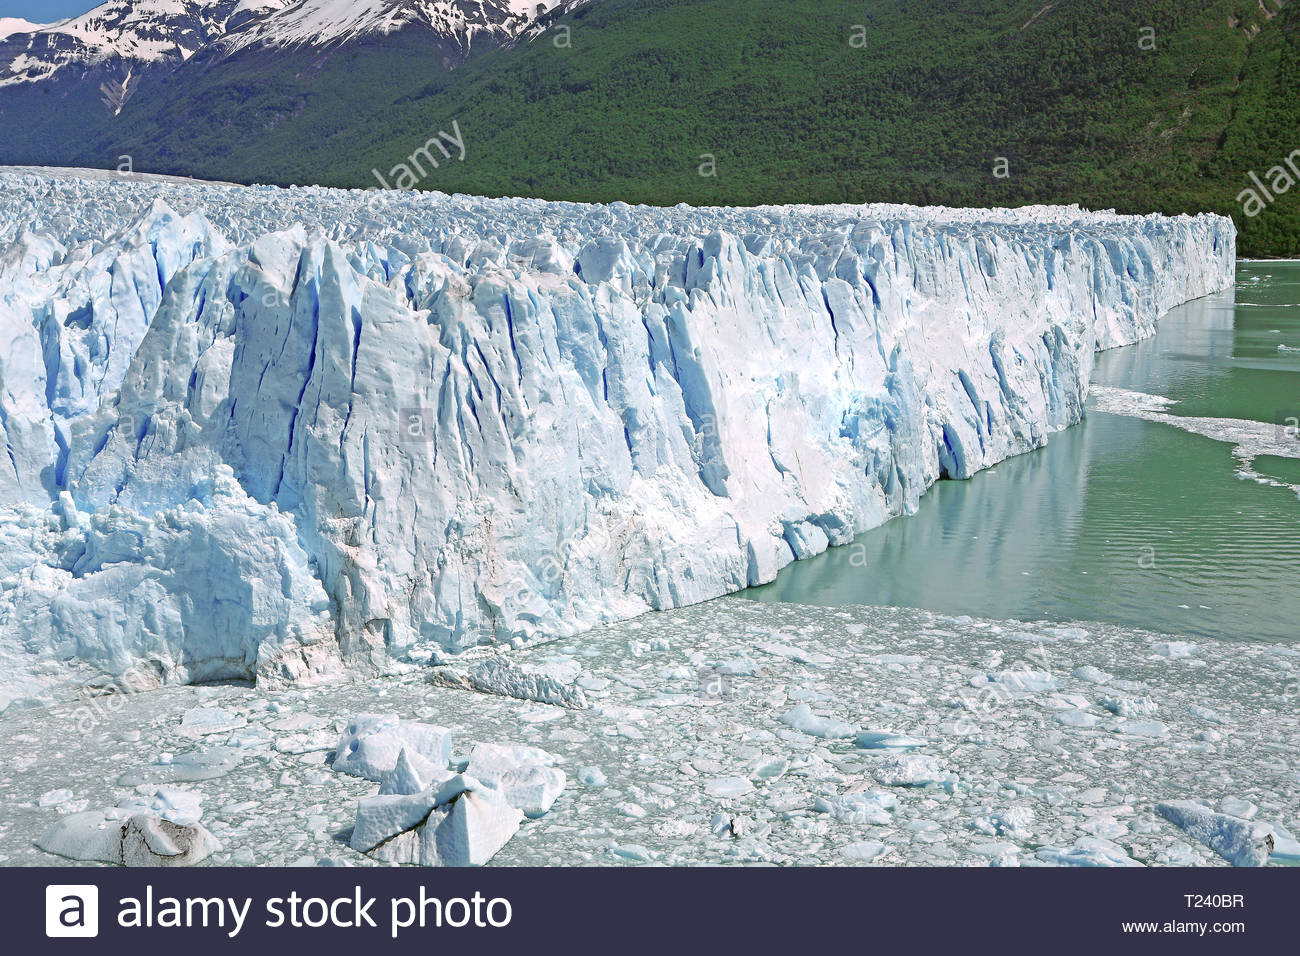 View on Perito Moreno Glacier, Santa Cruz Province, Patagonia, Argentina Stock Photo